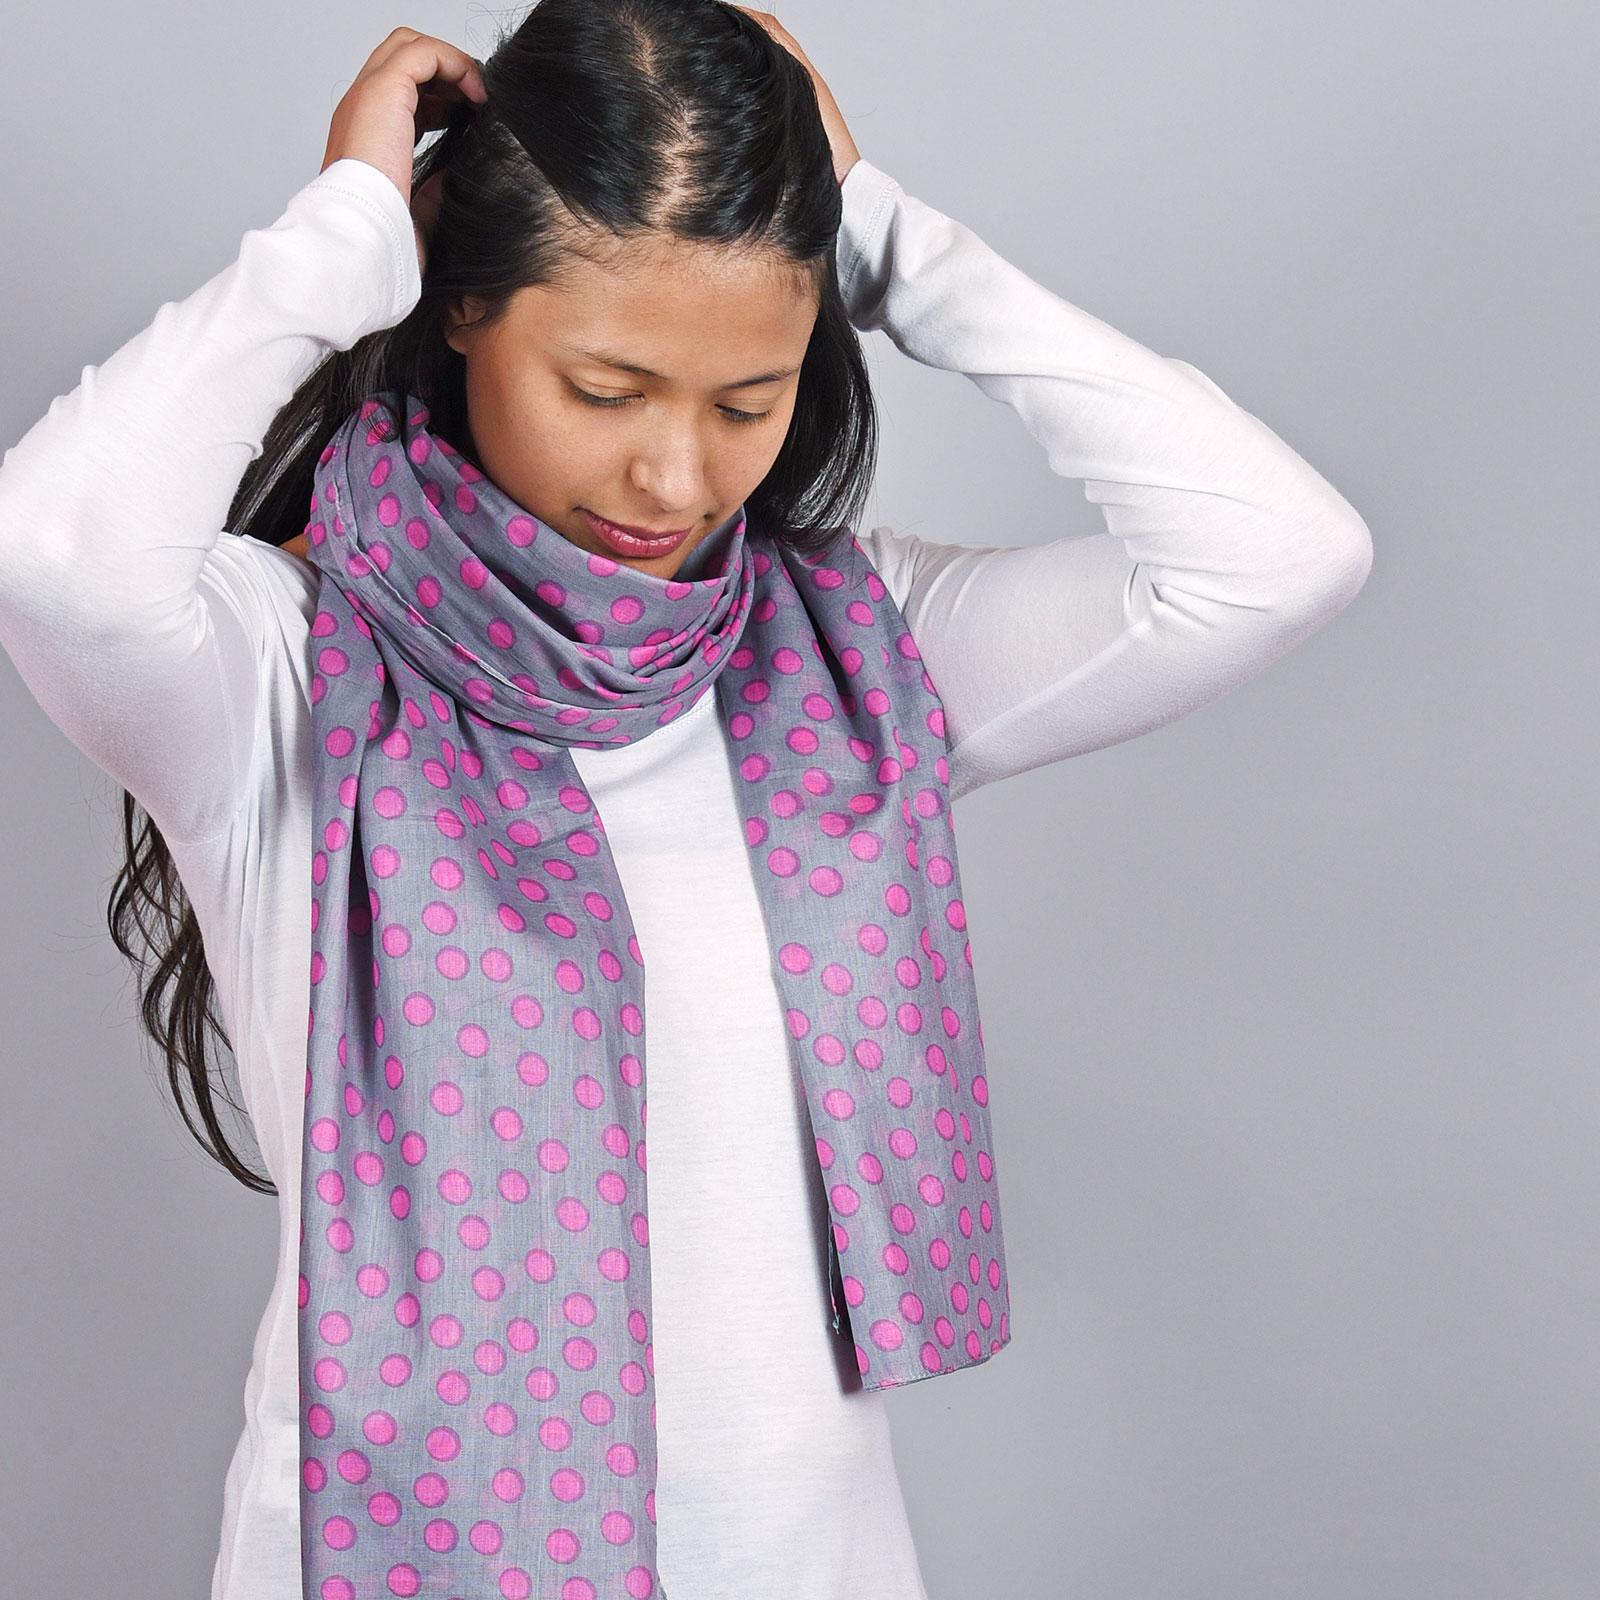 Chèche - Allée du foulard bffb26cee5a